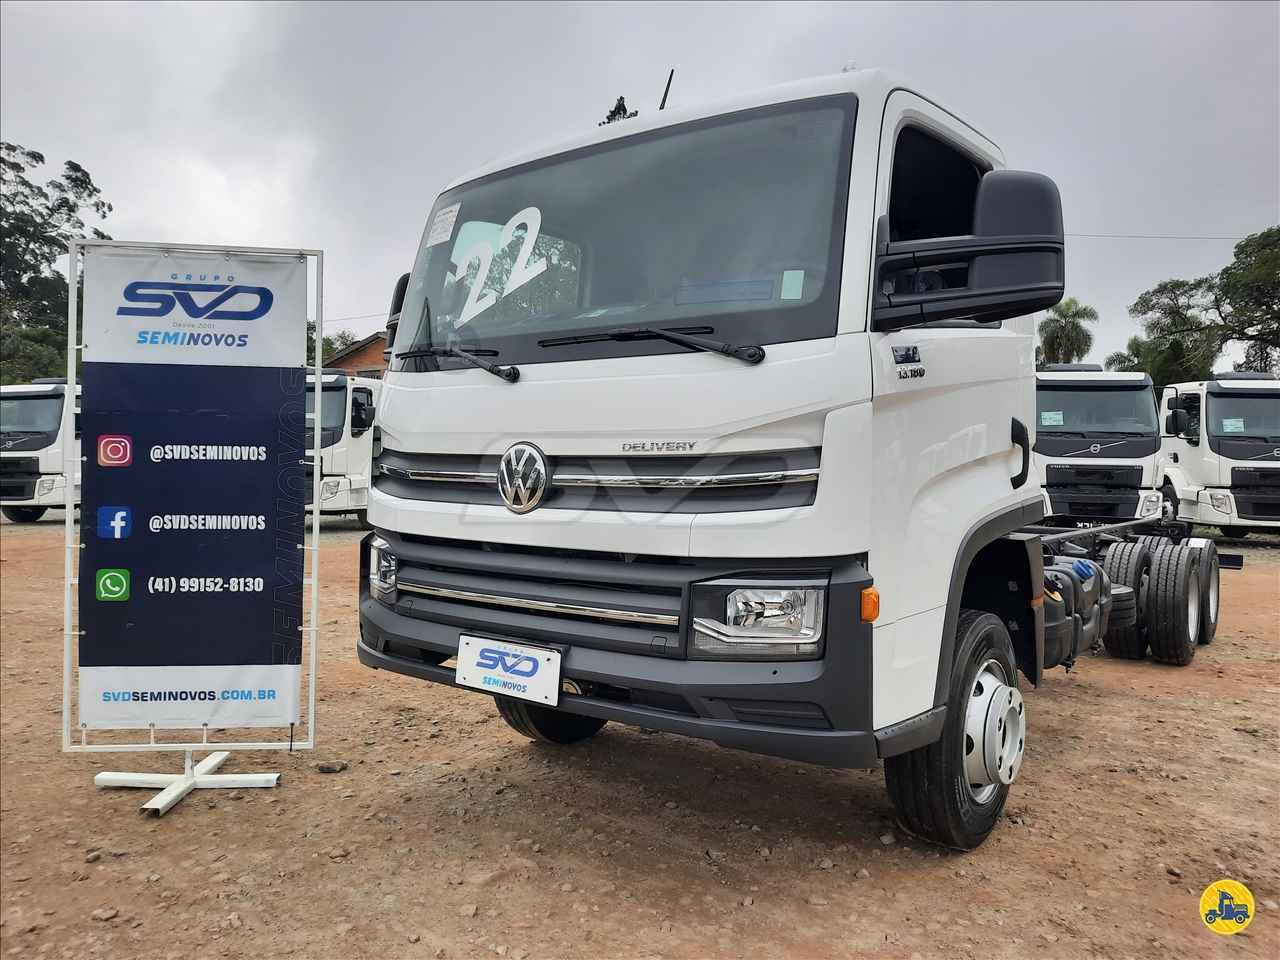 CAMINHAO VOLKSWAGEN VW 13180 Chassis Truck 6x2 SVD Seminovos CURITIBA PARANÁ PR